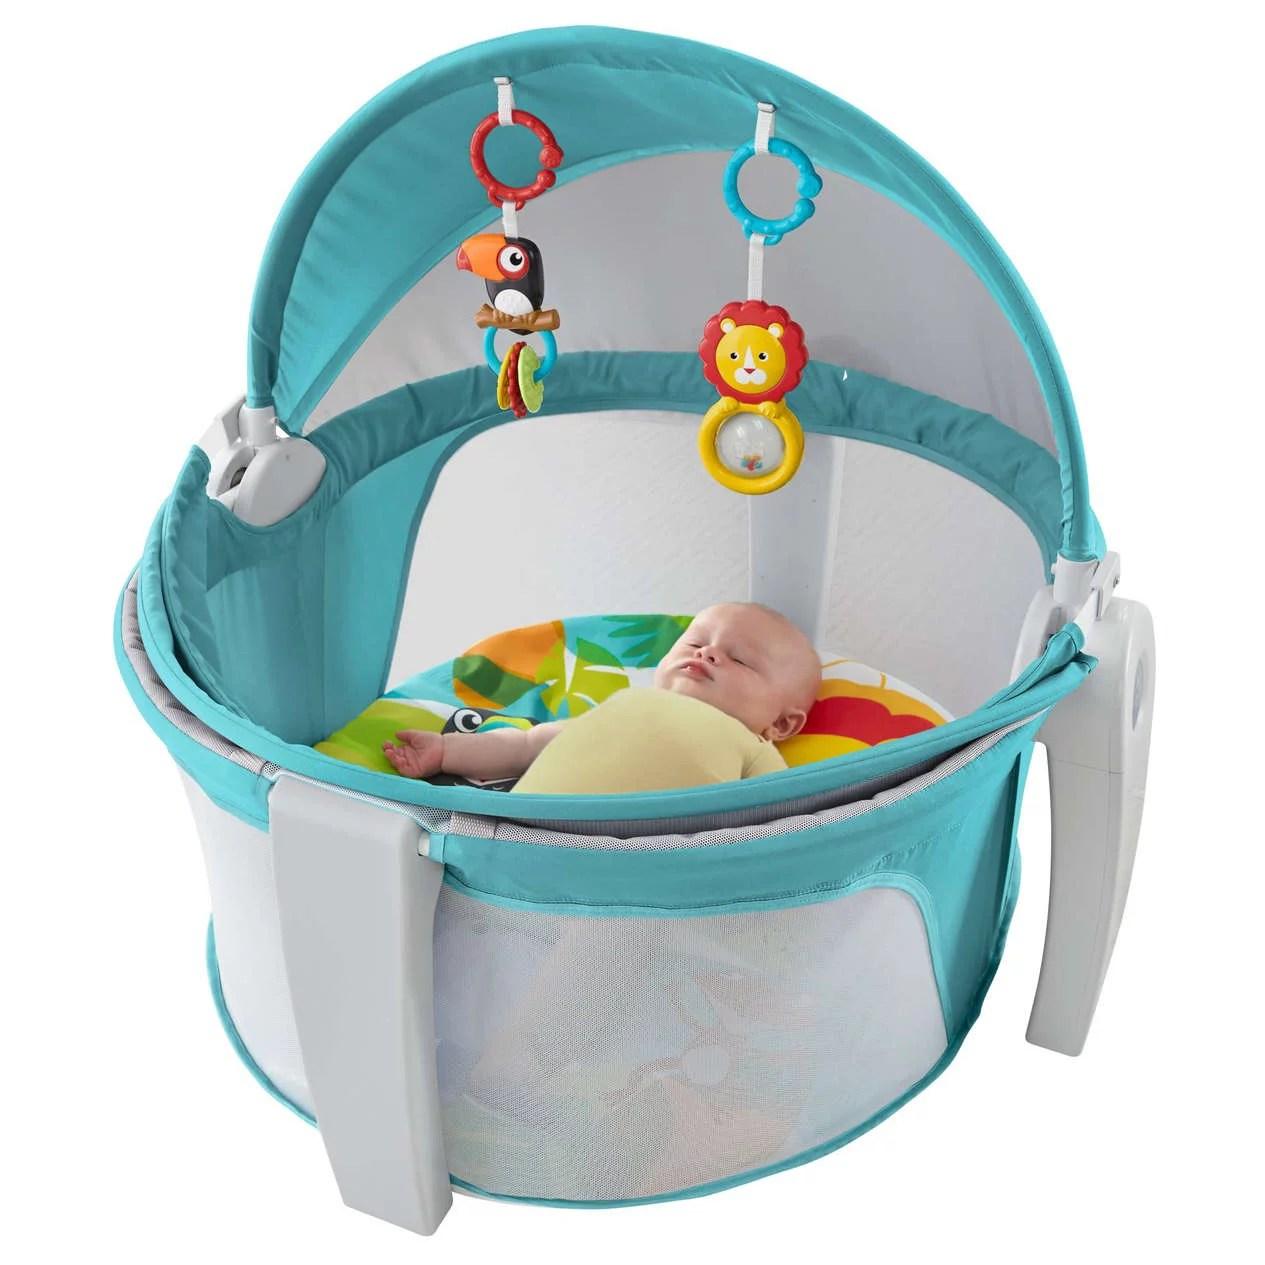 FisherPrice OnTheGo Baby Dome  Walmartcom